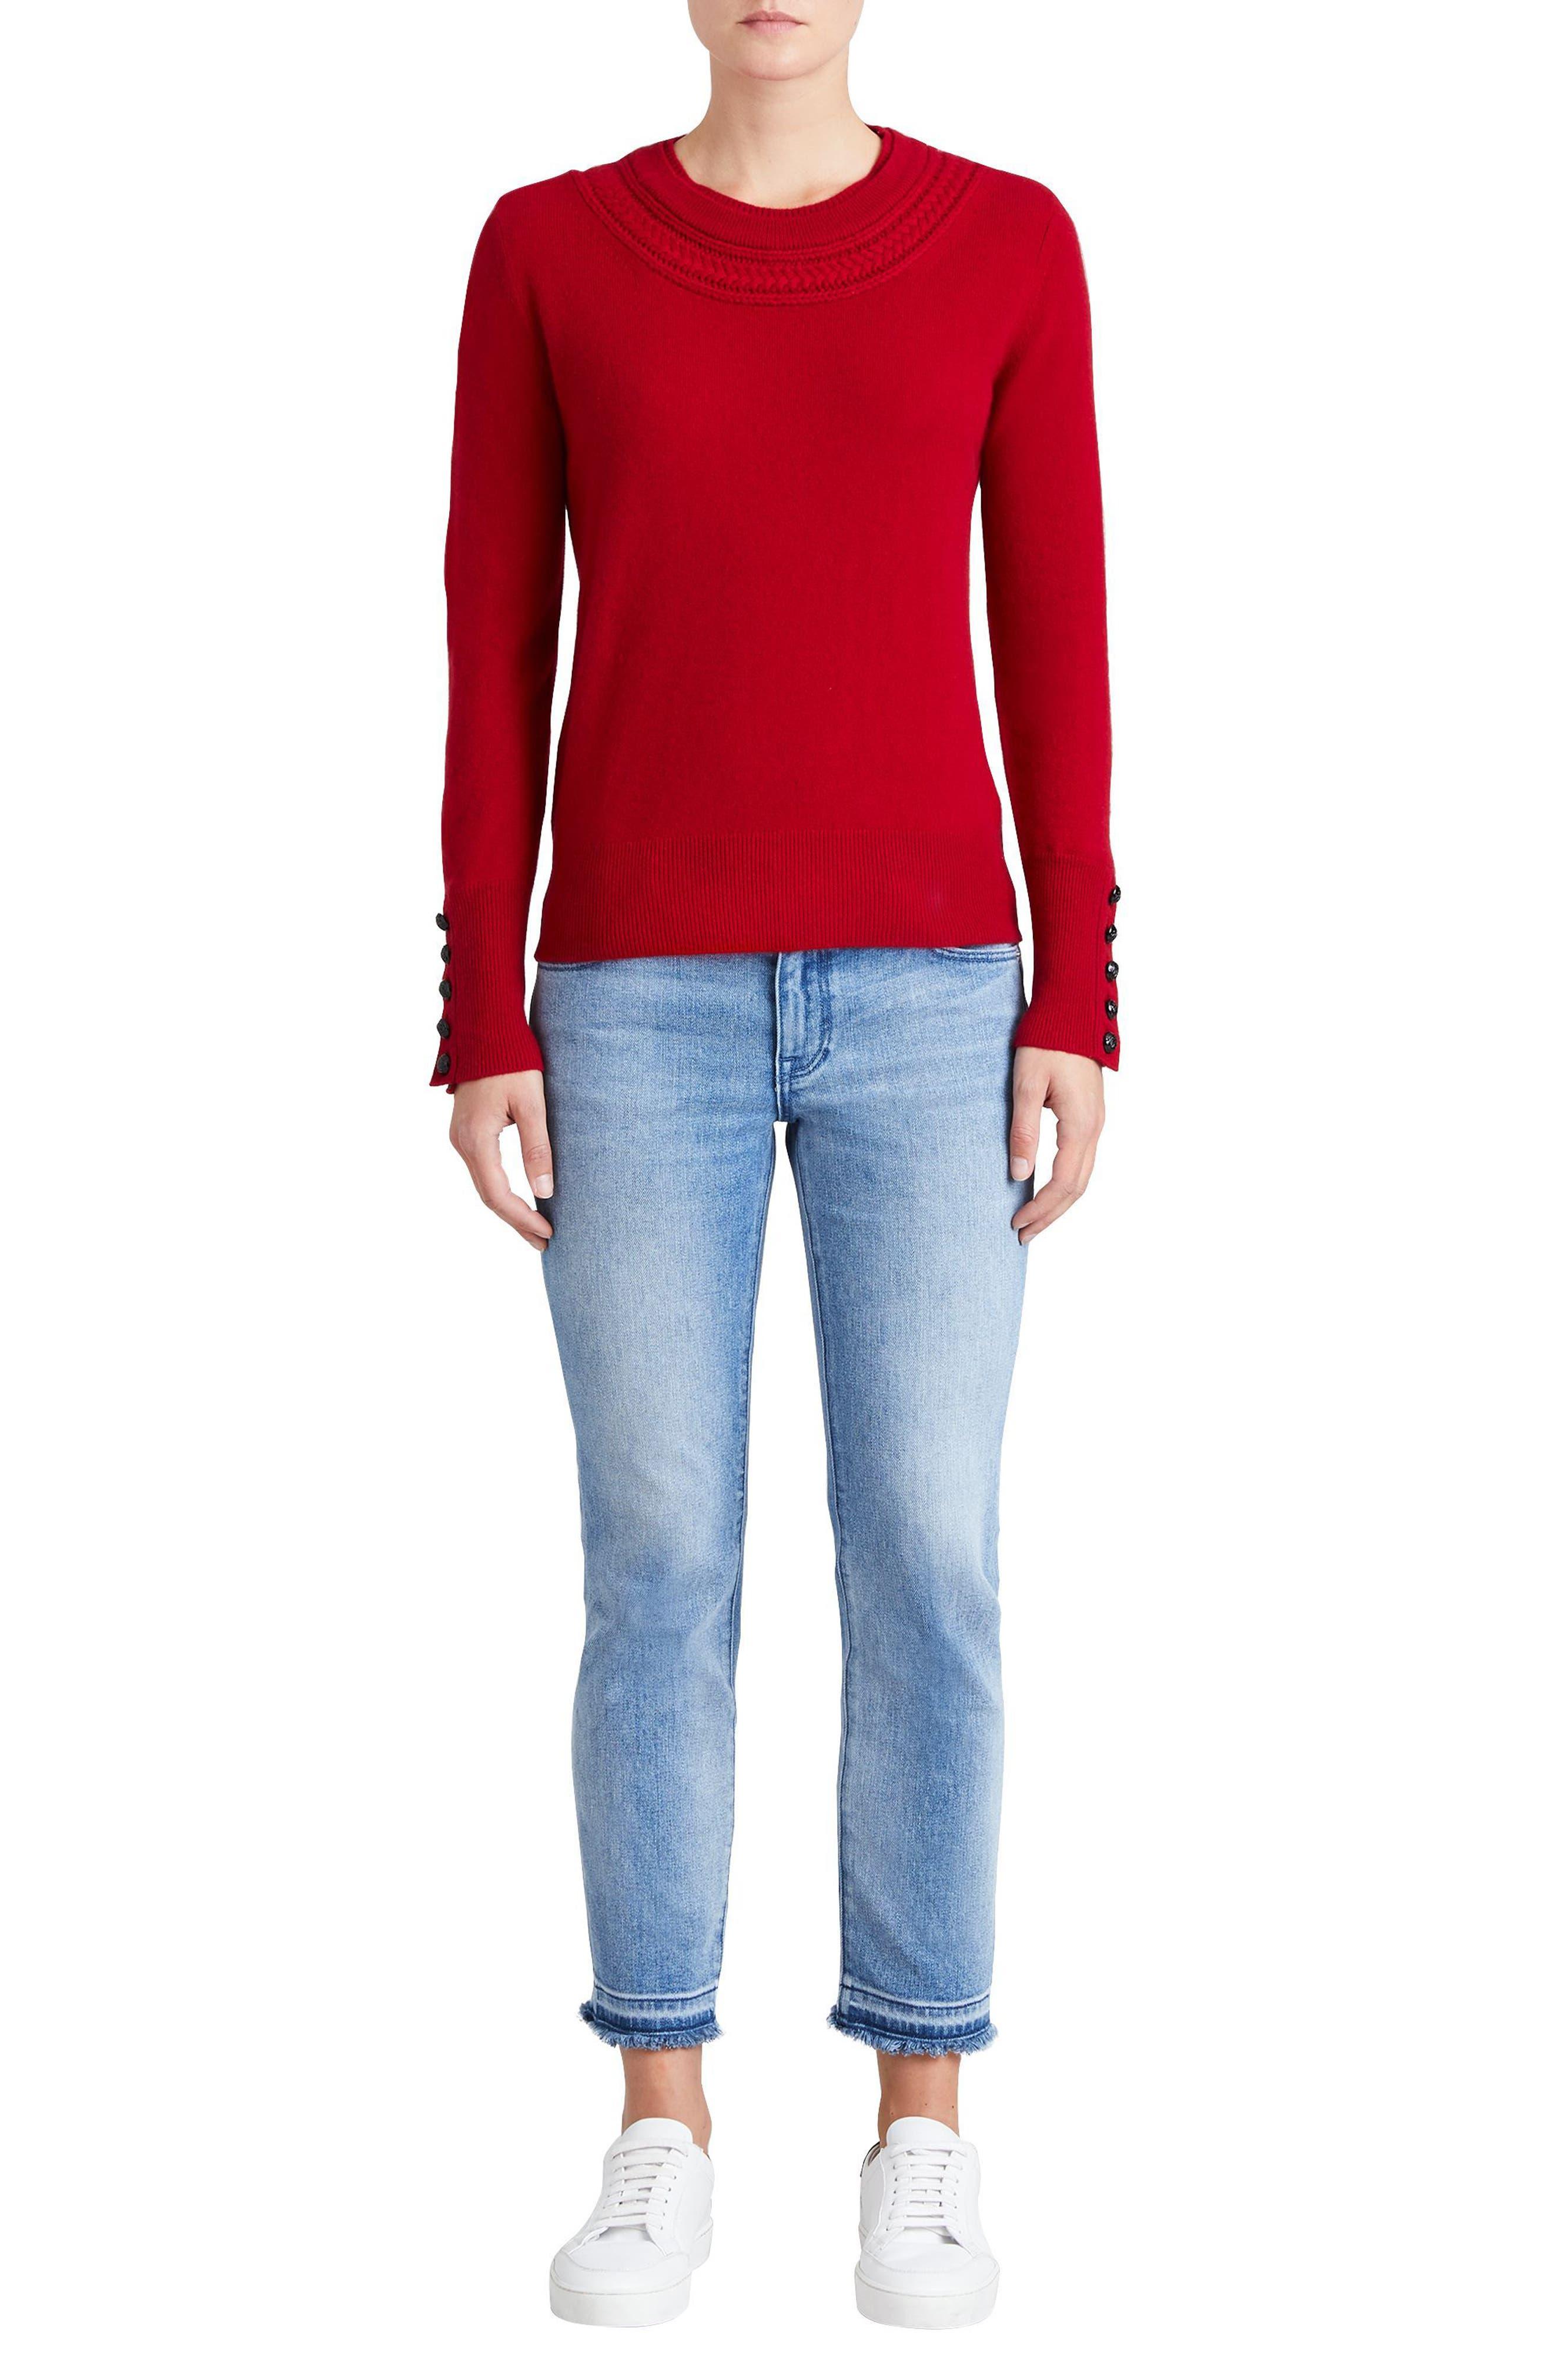 Carapelle Cashmere Sweater,                             Alternate thumbnail 15, color,